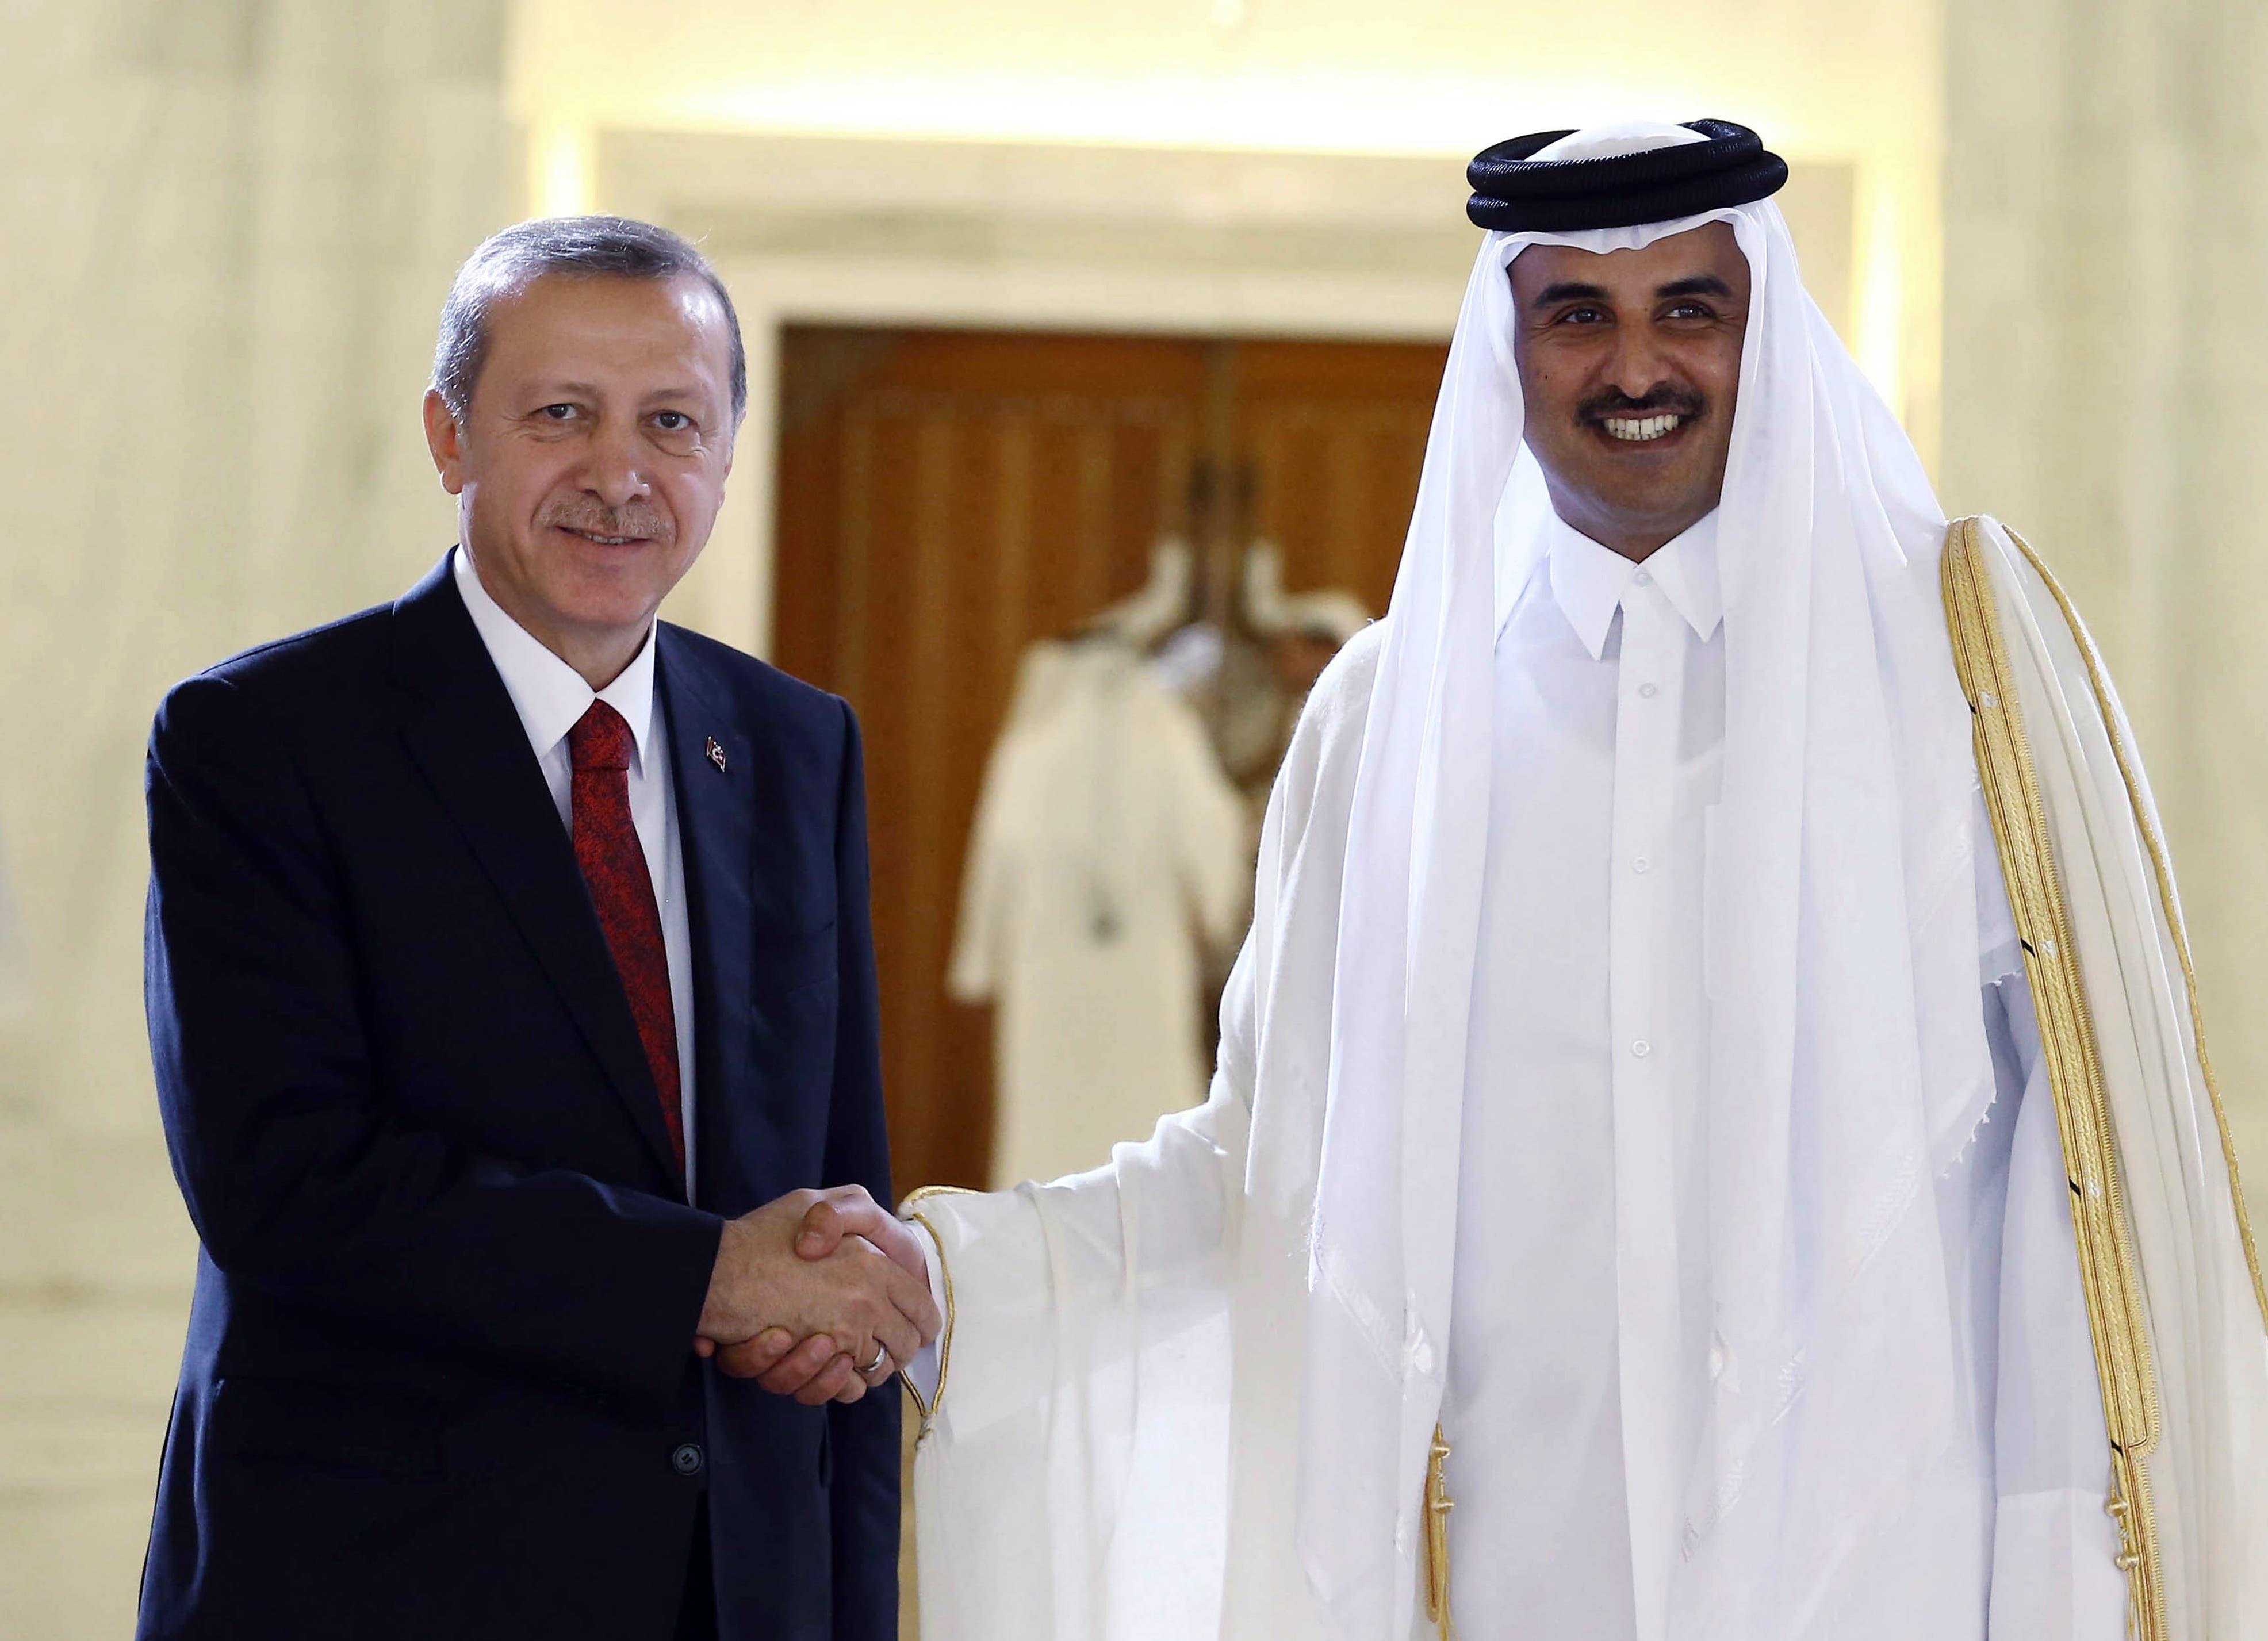 Turkey's President Recep Tayyip Erdogan, left, and Qatar's Emir Tamim bin Hamad Al Thani shake hands during a ceremony in Doha, Qatar, Wednesday, Dec. 2, 2015. (AP)